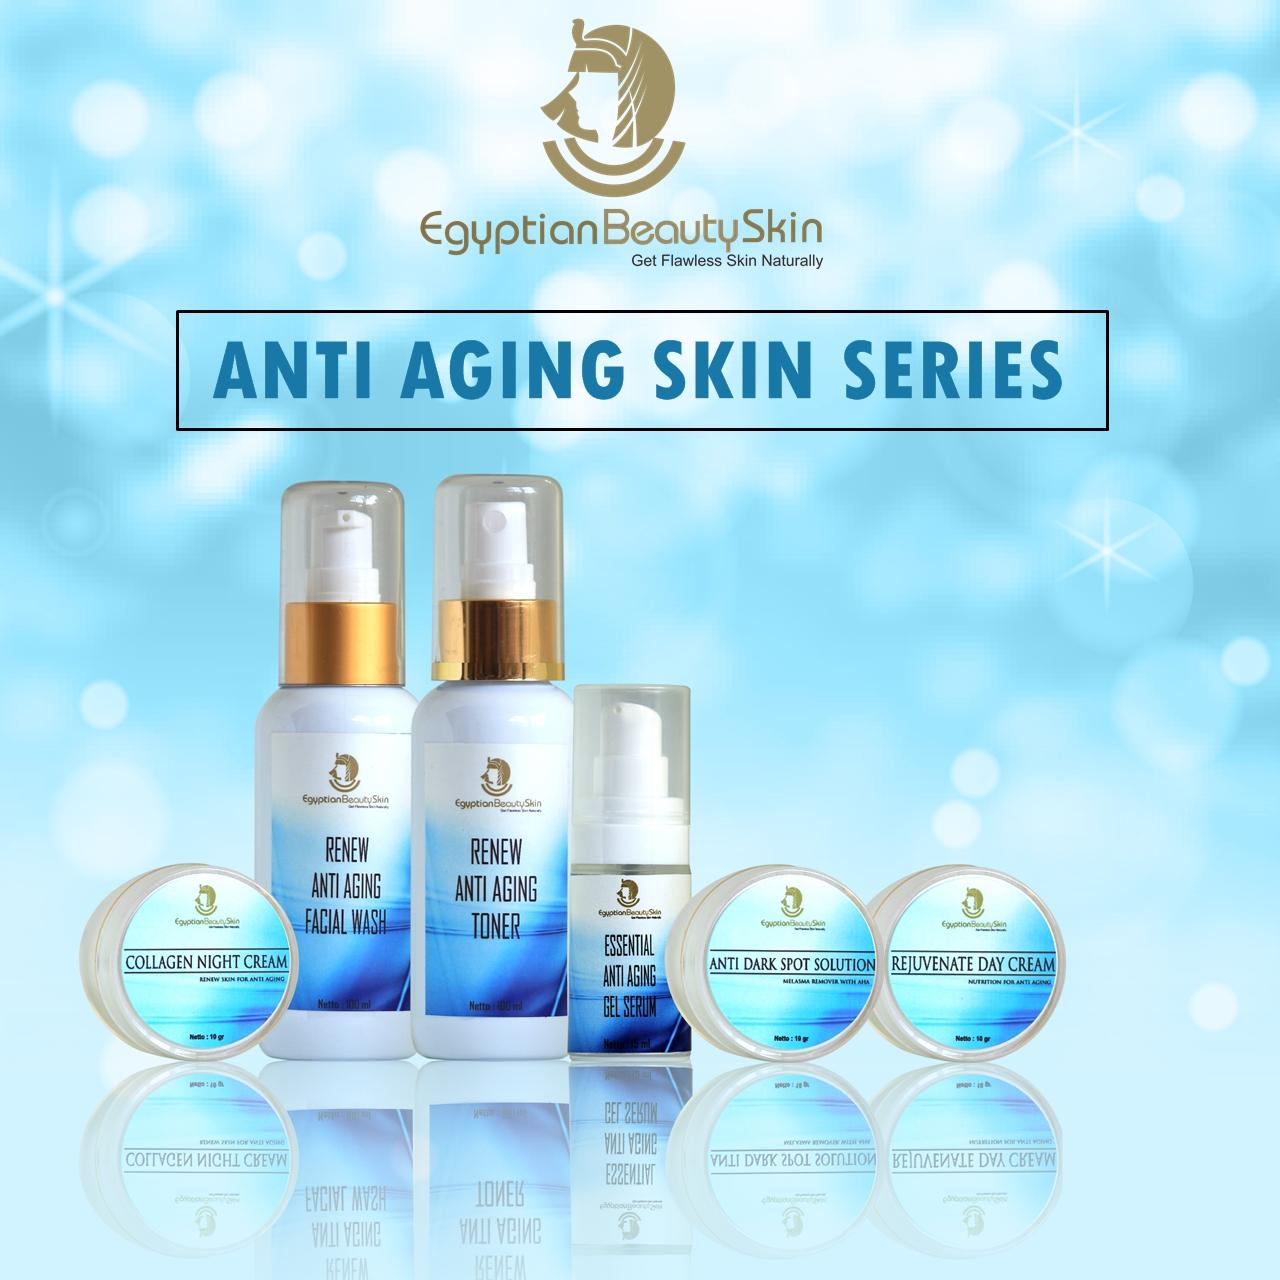 Anti Aging Series